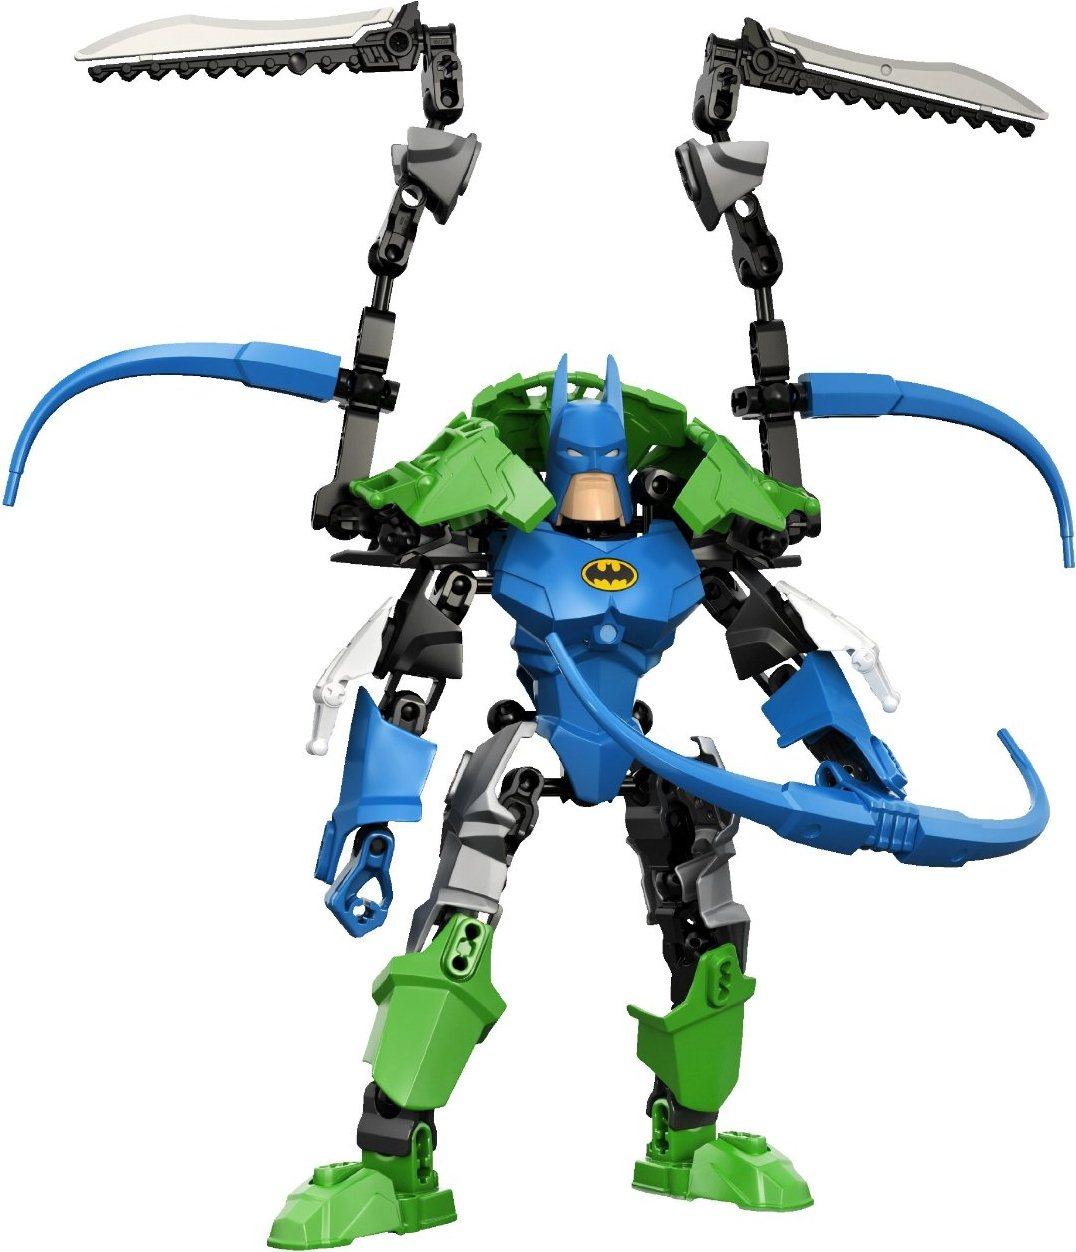 Batman and Green Lantern Combiner Model